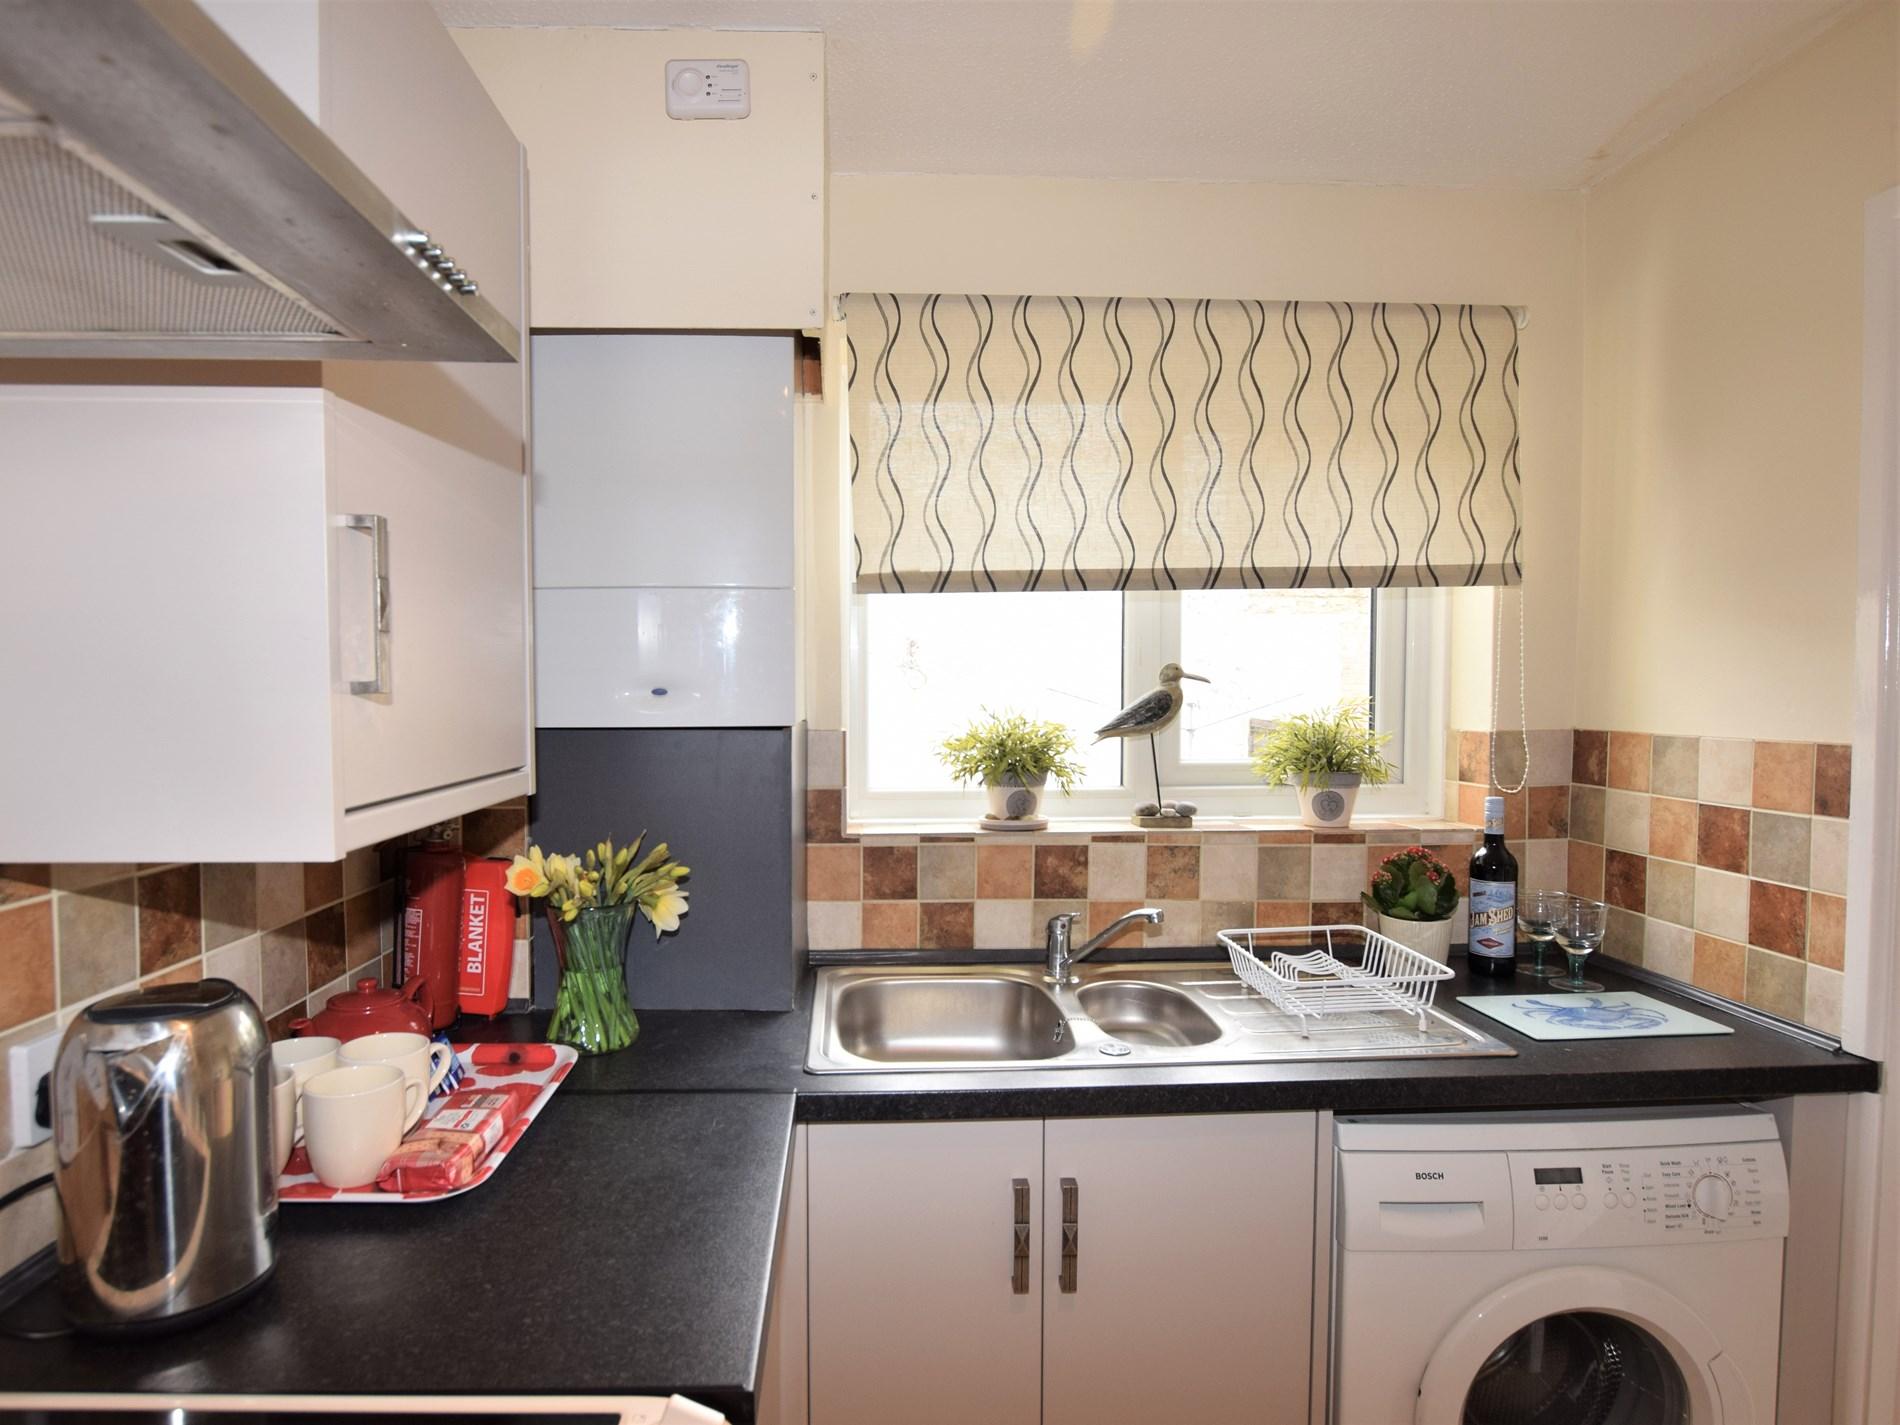 3 Bedroom Cottage in Sheringham, East Anglia